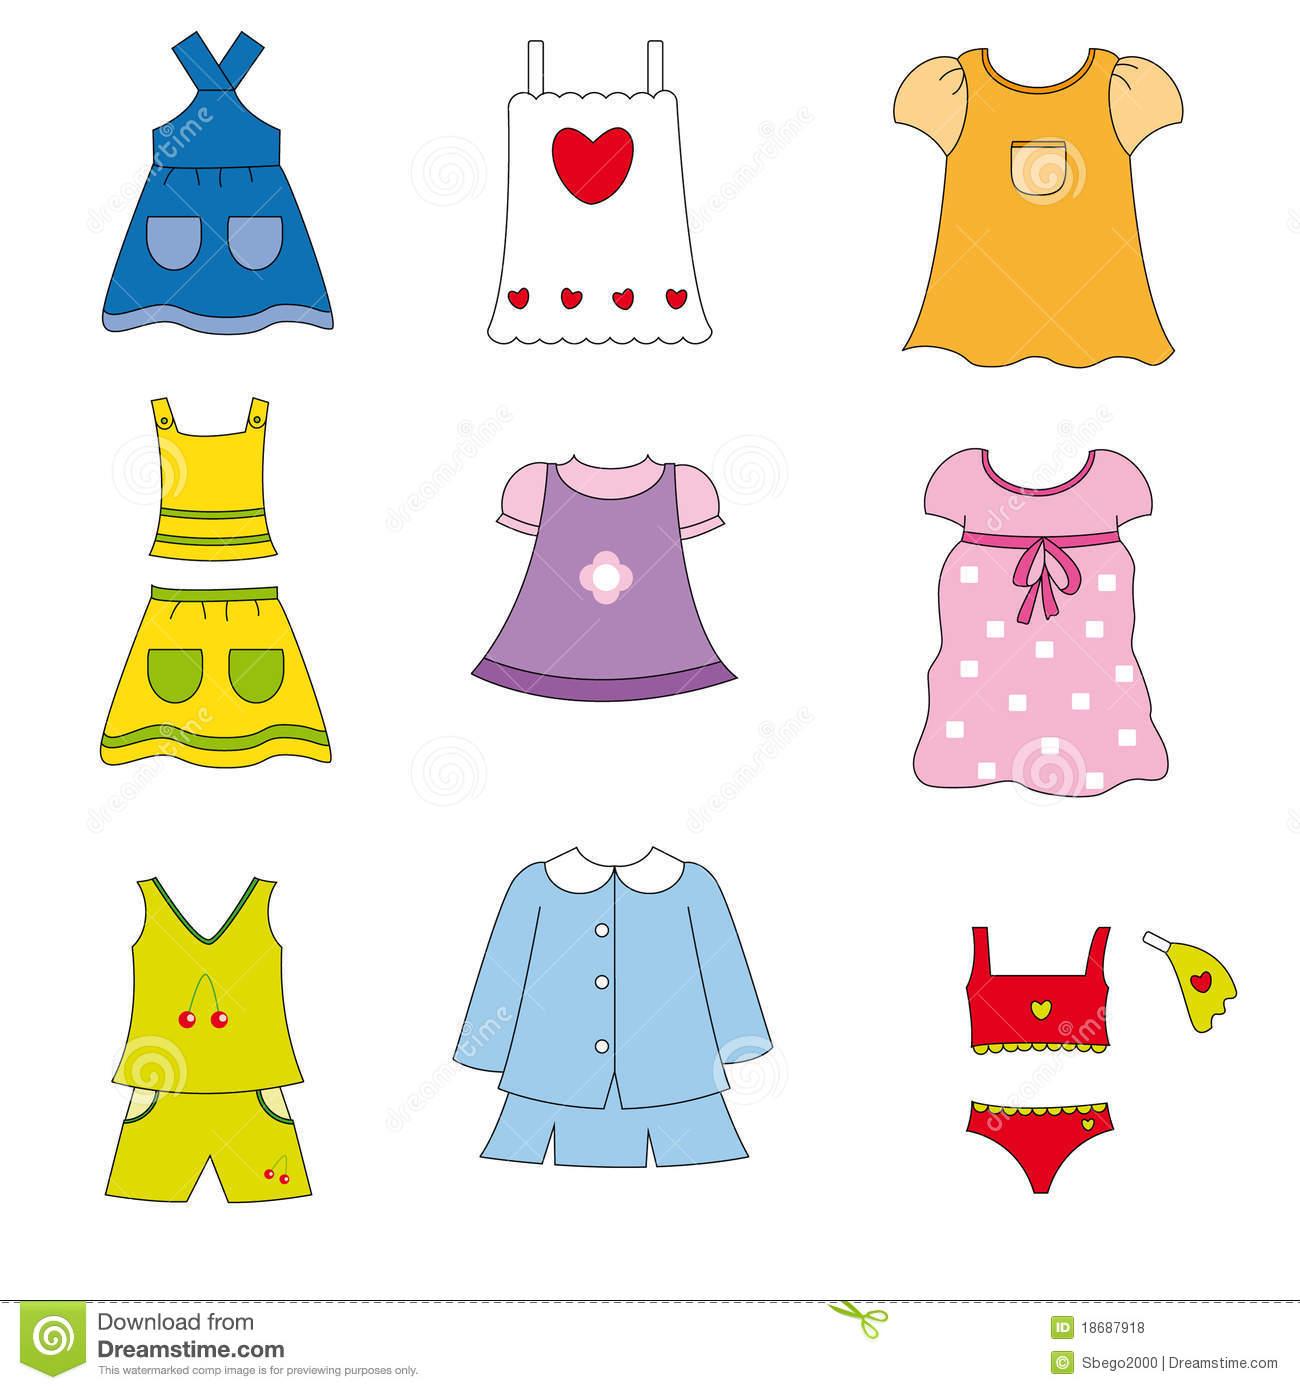 Boy clothing 4 seasons clipart.